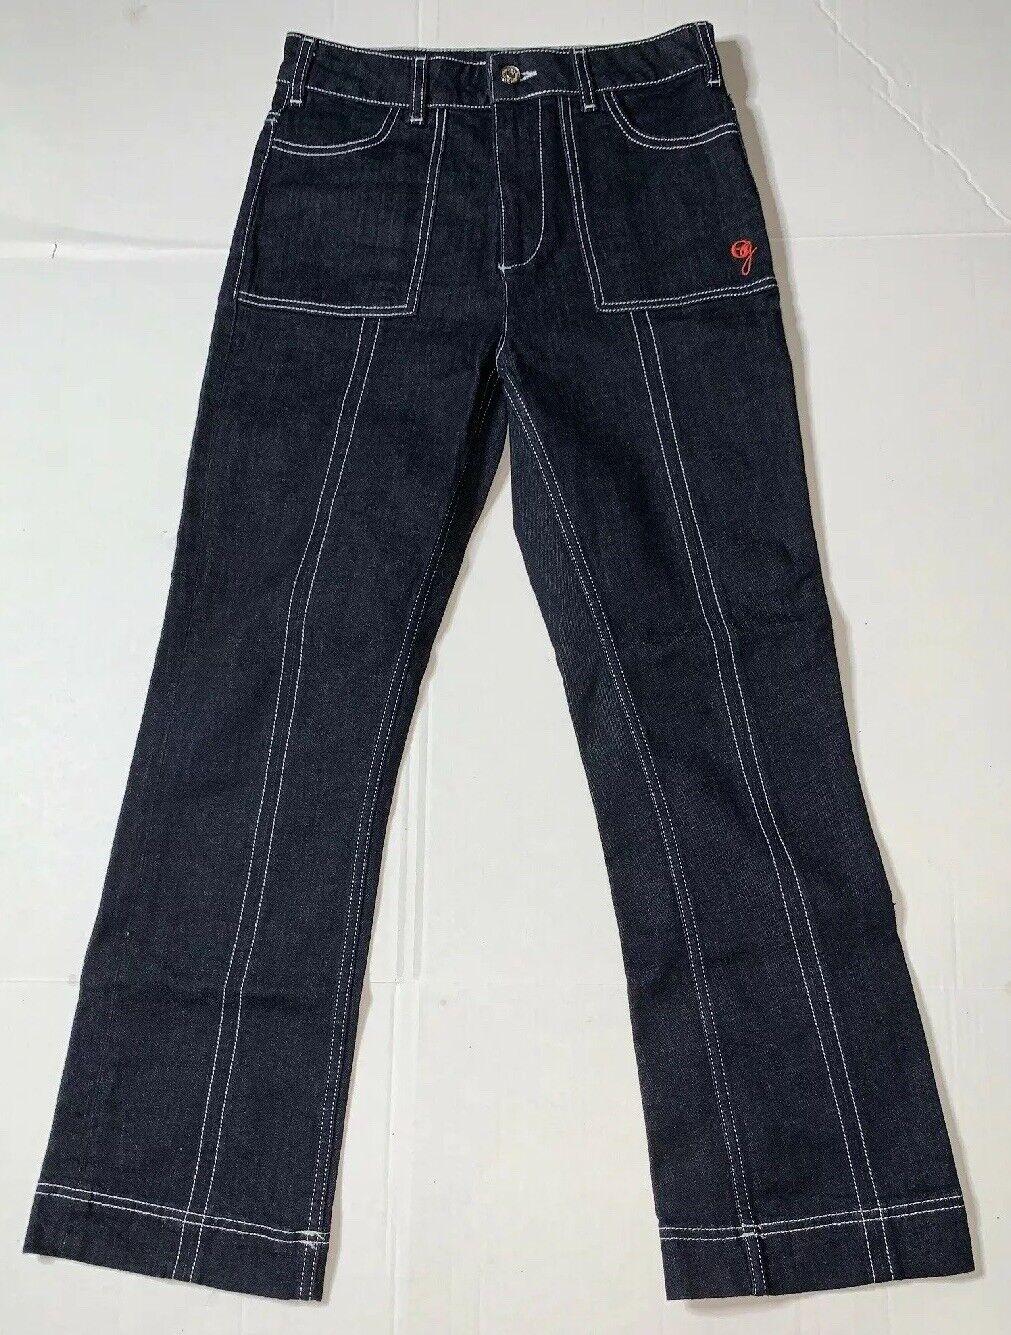 Preowned- Ganni 1676 Sheffield Denim Jeans Womens (Size 36)